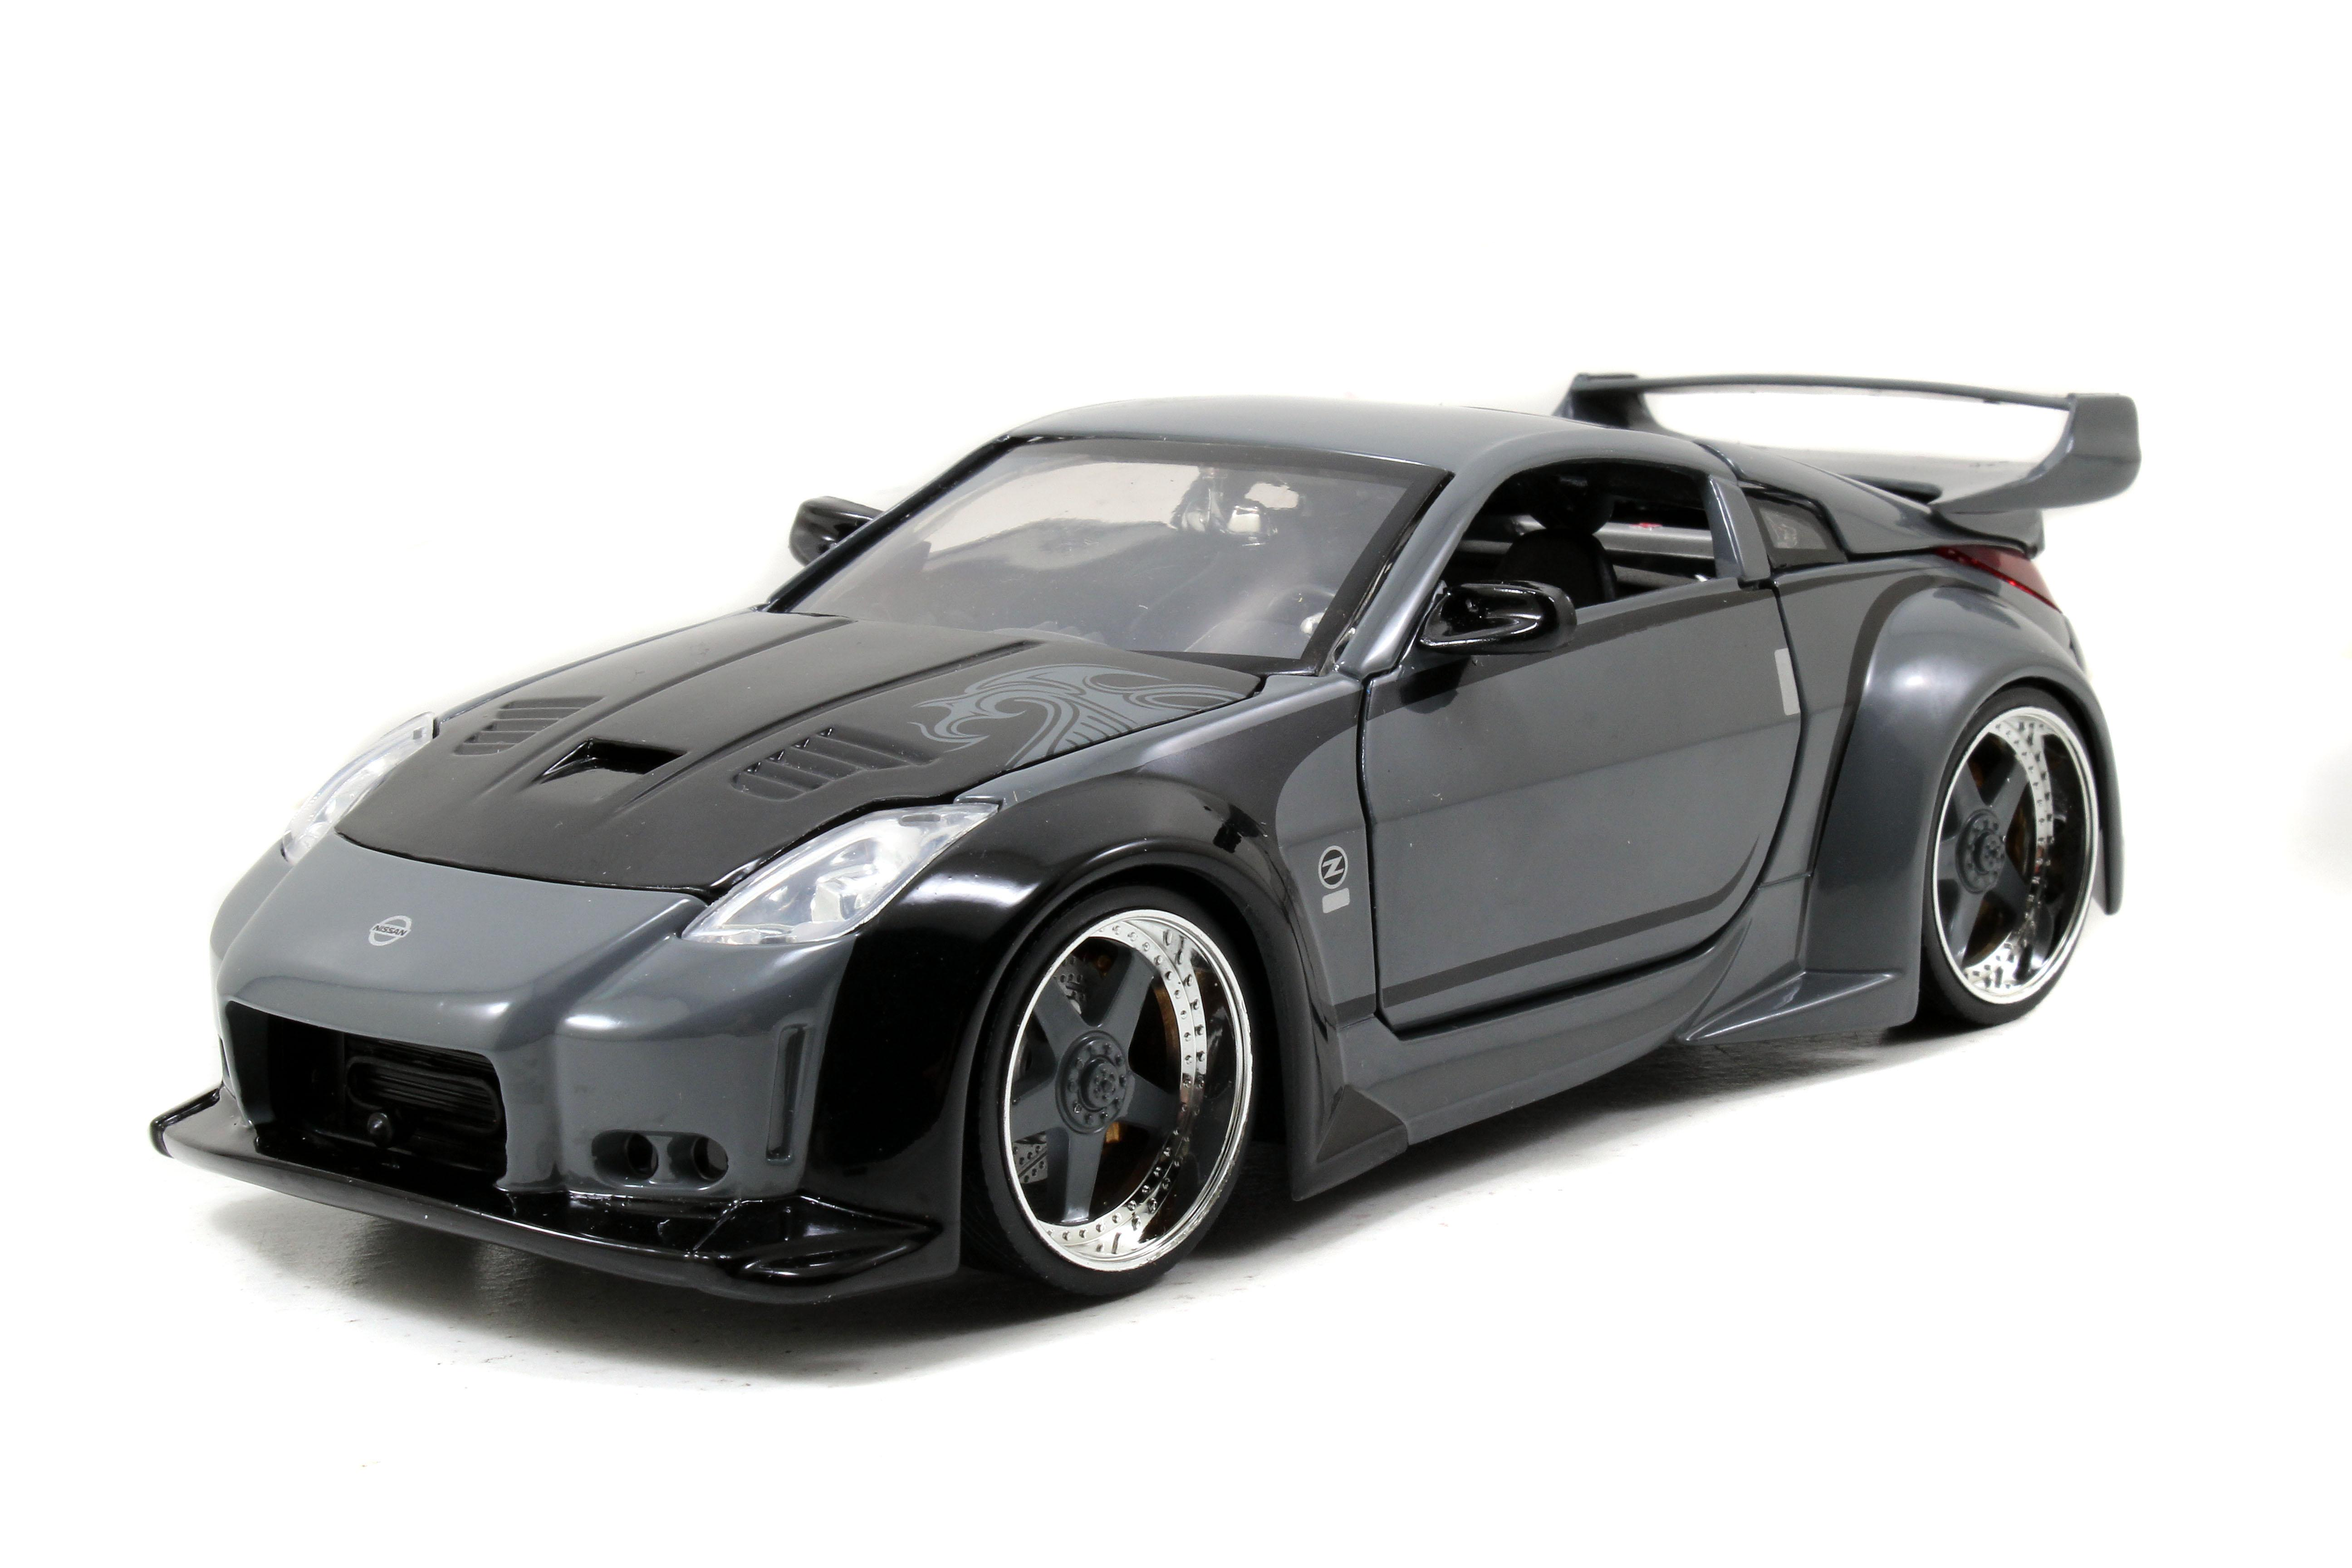 Jada Toys Fast & Furious 1 24 Diecast Nissan 350Z Vehicle